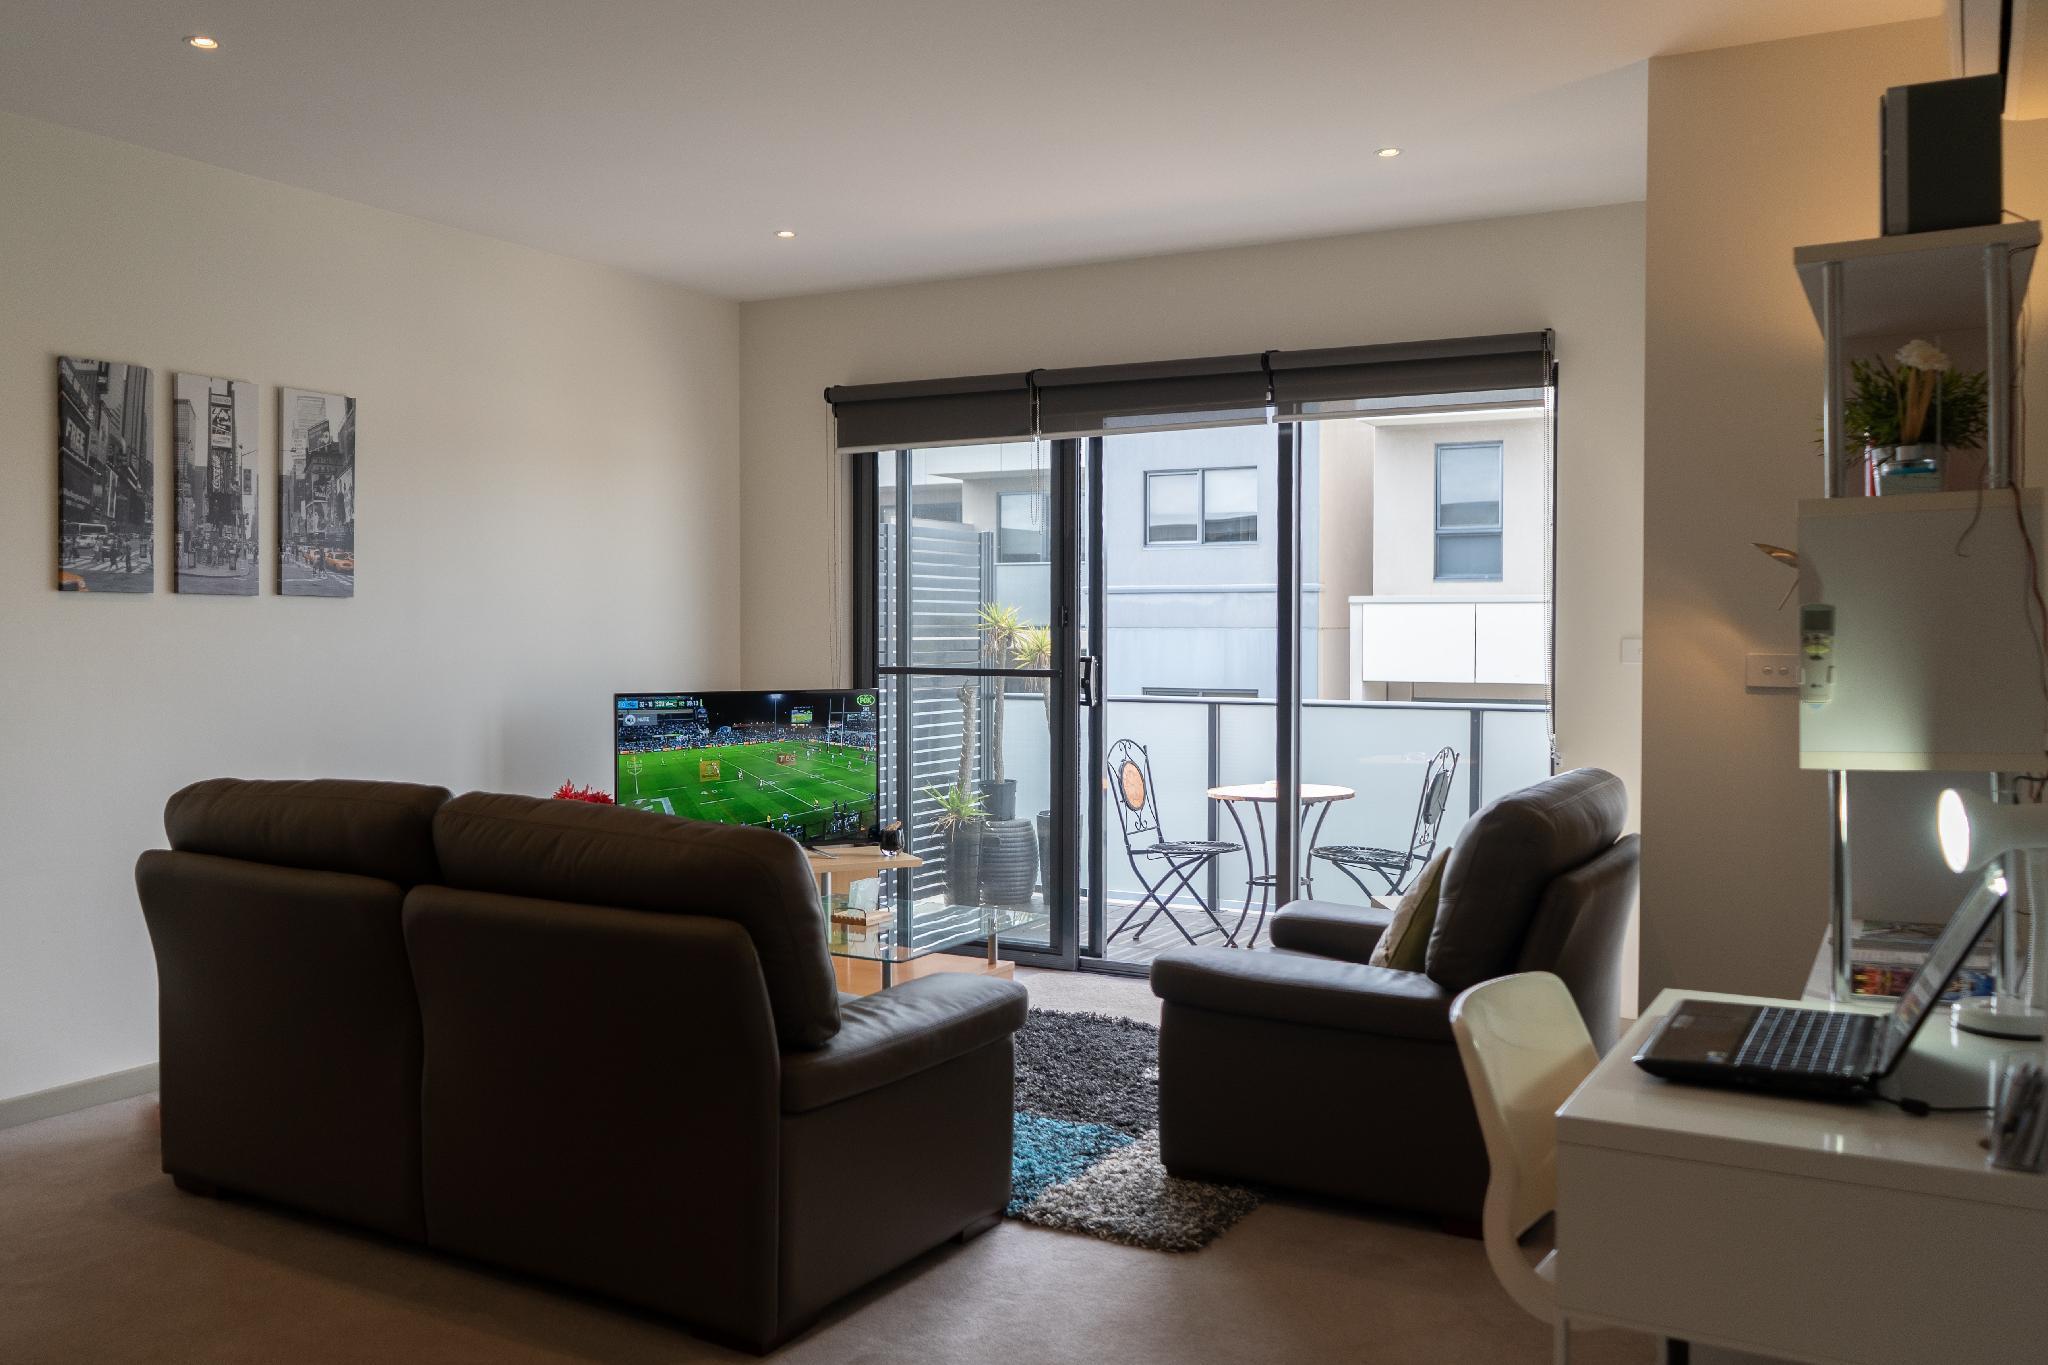 Apartments Of Waverley's Alluring 1 Bedroom